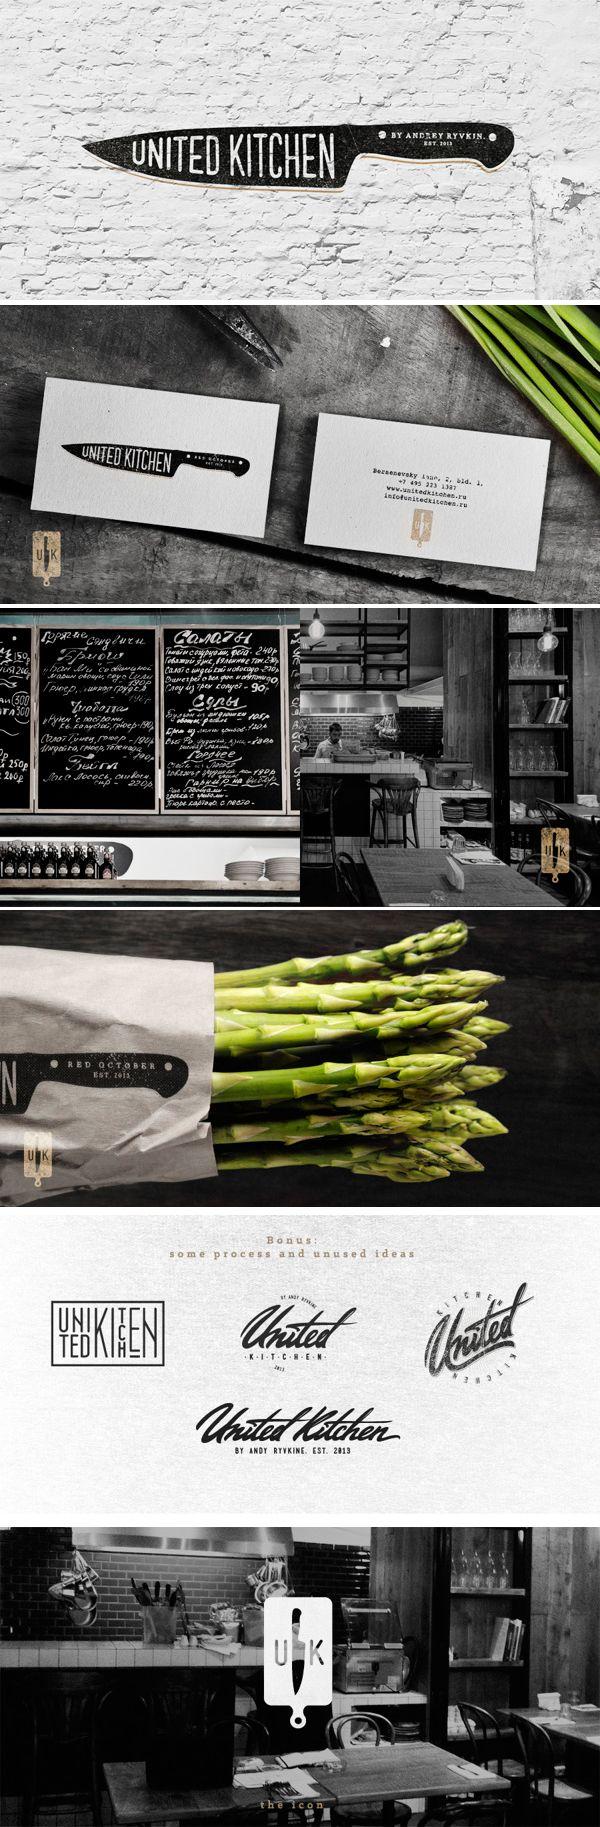 United Kitchen. #restaurantgraphics #typography